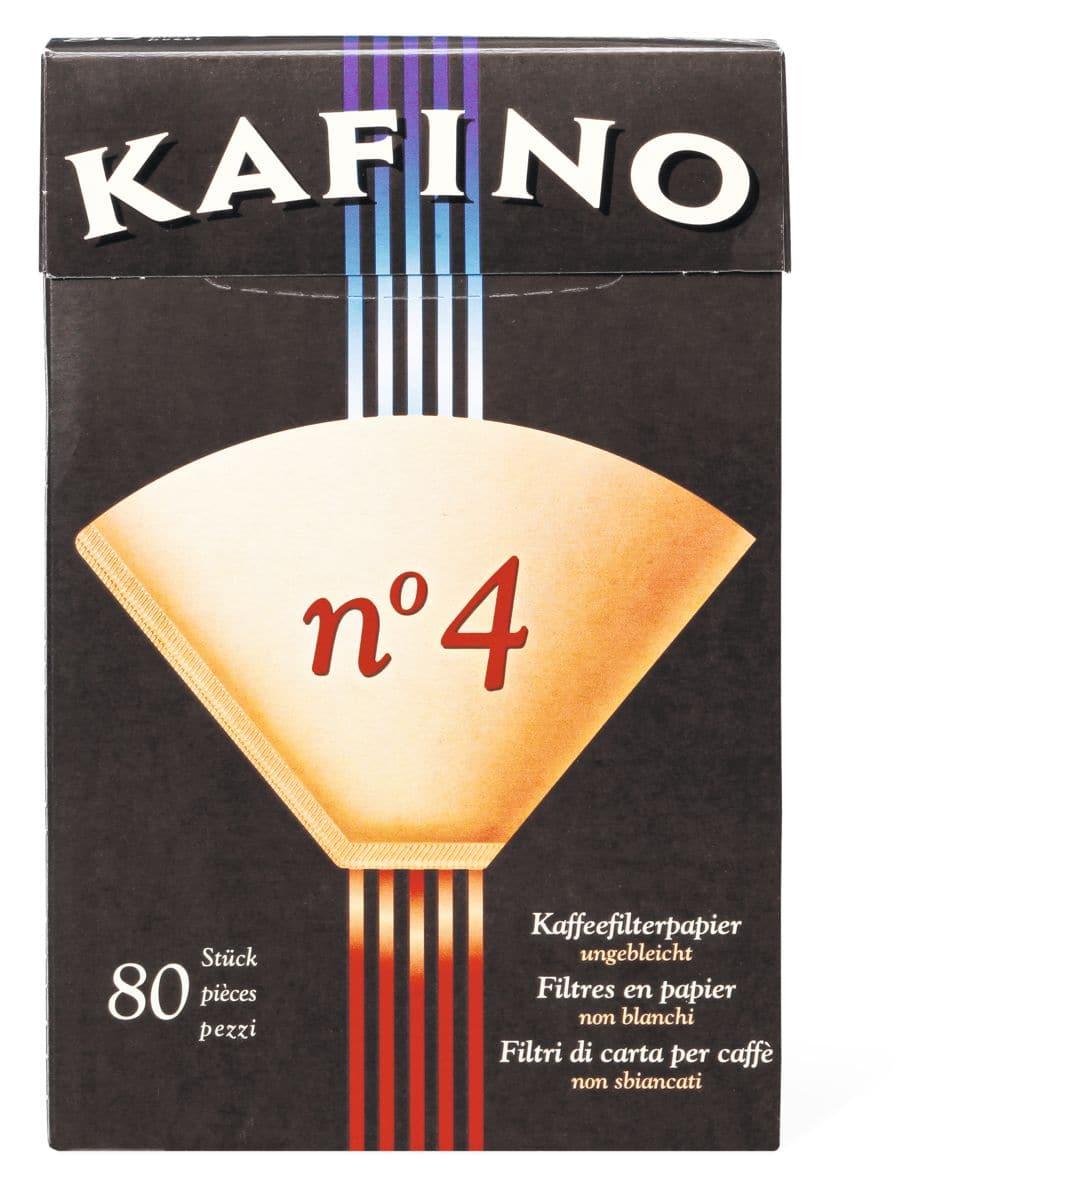 Kafino n°4 Filtri Carta caffè